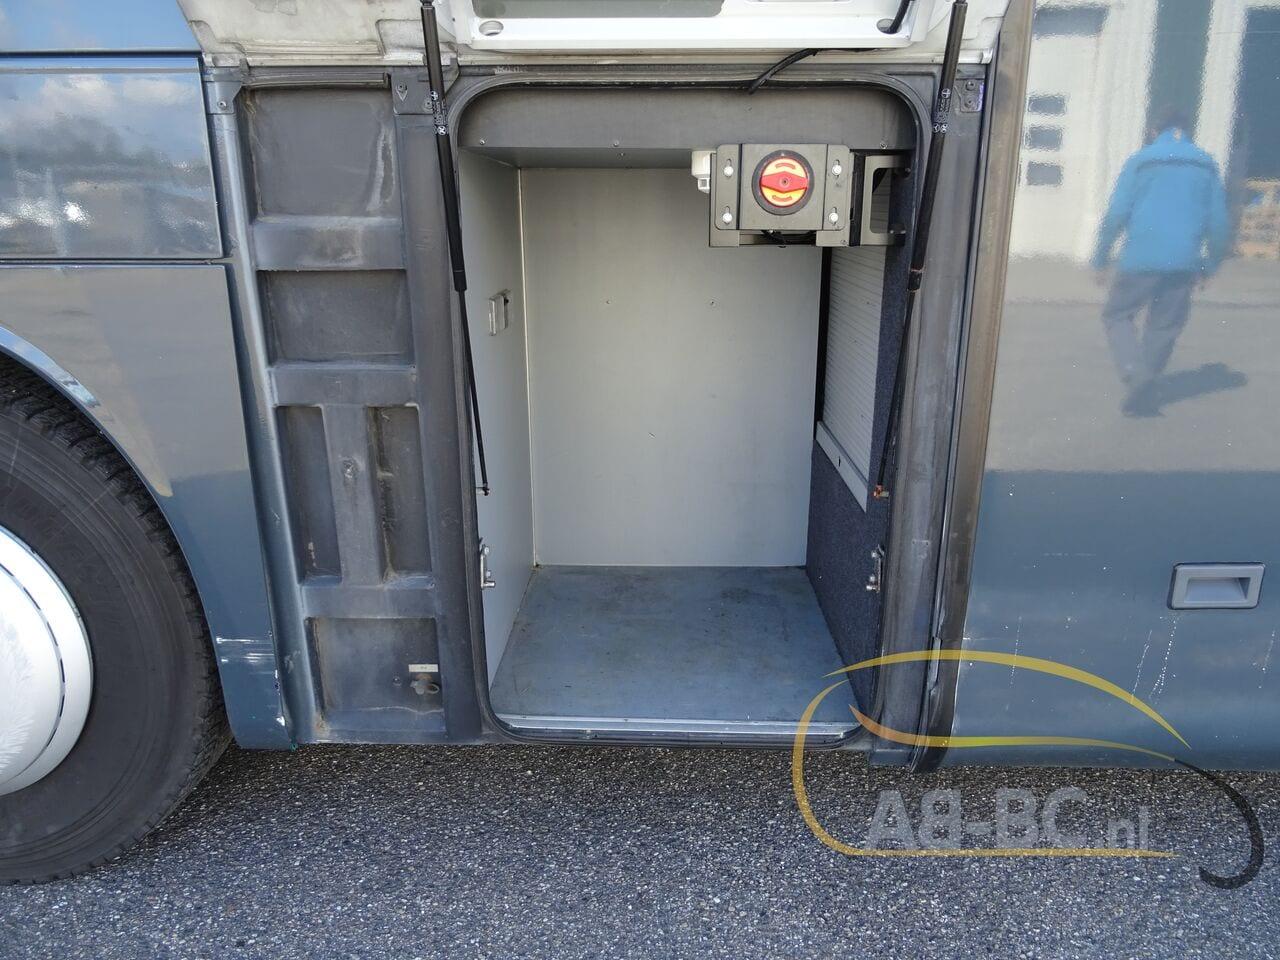 coach-busSETRA-S415-GT-HD-FINAL-EDITION-51-SEATS-LIFTBUS---1620381706909413905_big_fa5804bd7020bf619bd9e9a039633cdf--21050713010665719300